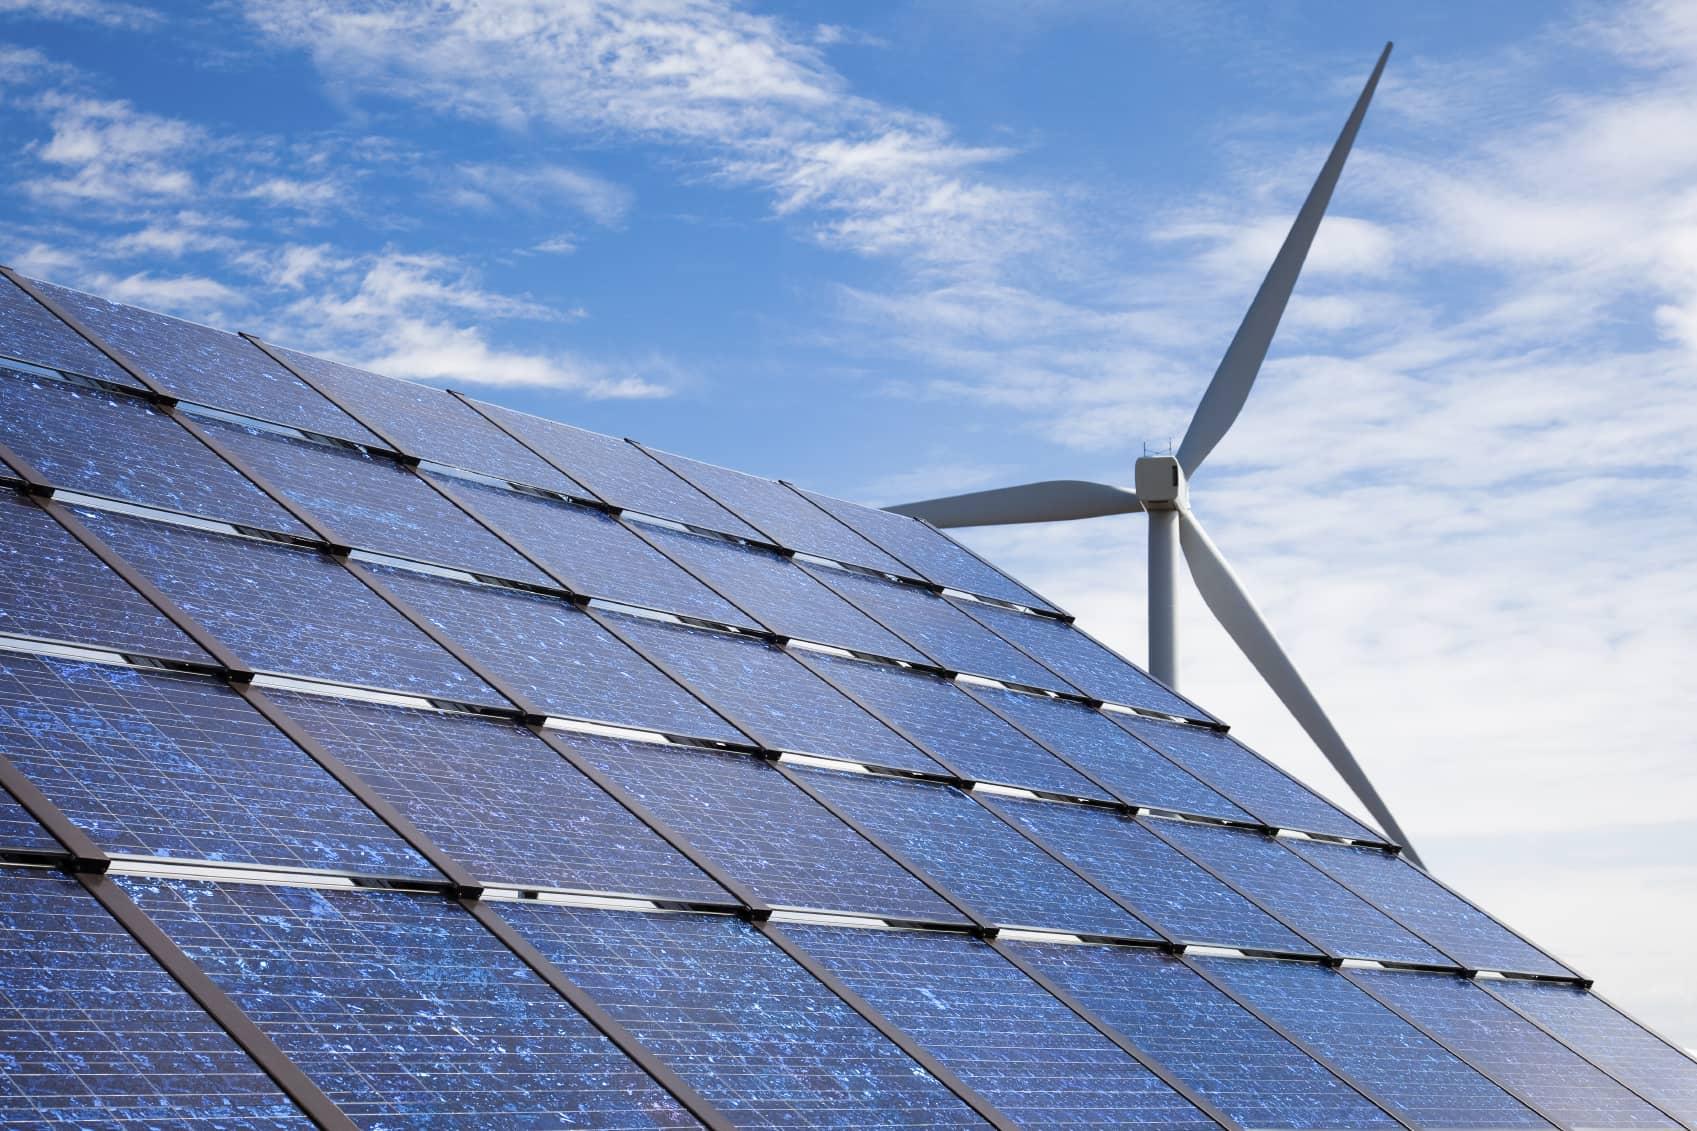 iStock_000013699352_Medium Could The U.S. Switch To 100% Renewable Energy?